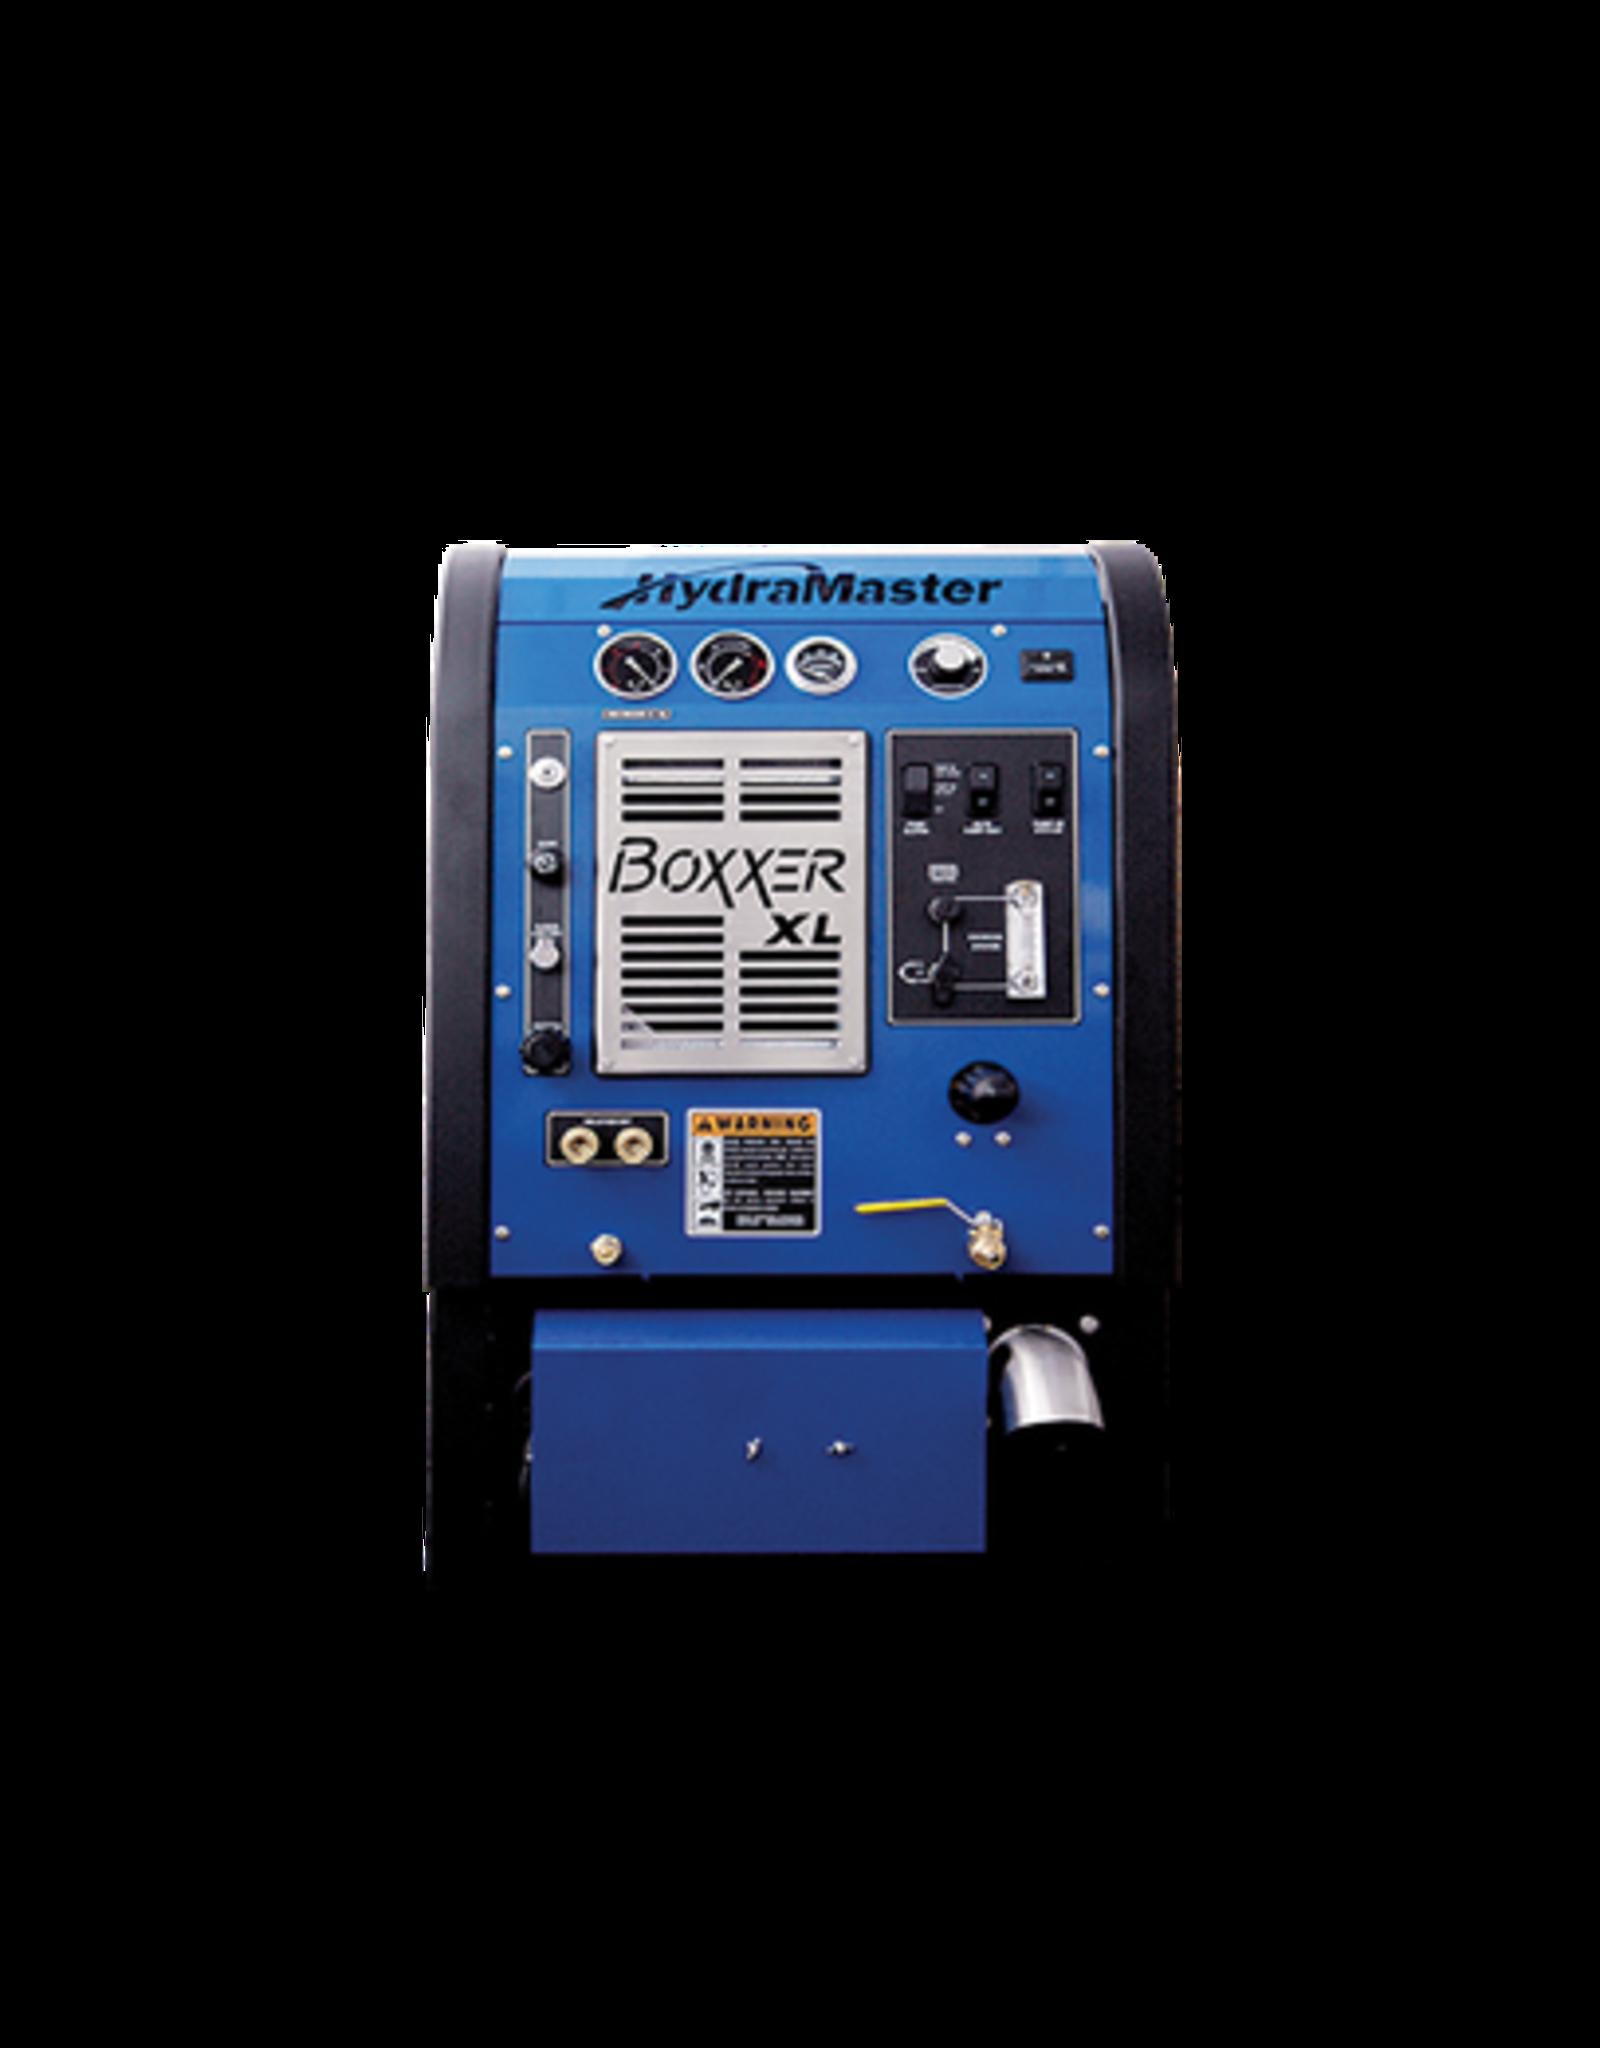 Hydramaster Boxxer XL w/ 70 gal Maxx-Air™ recovery tank